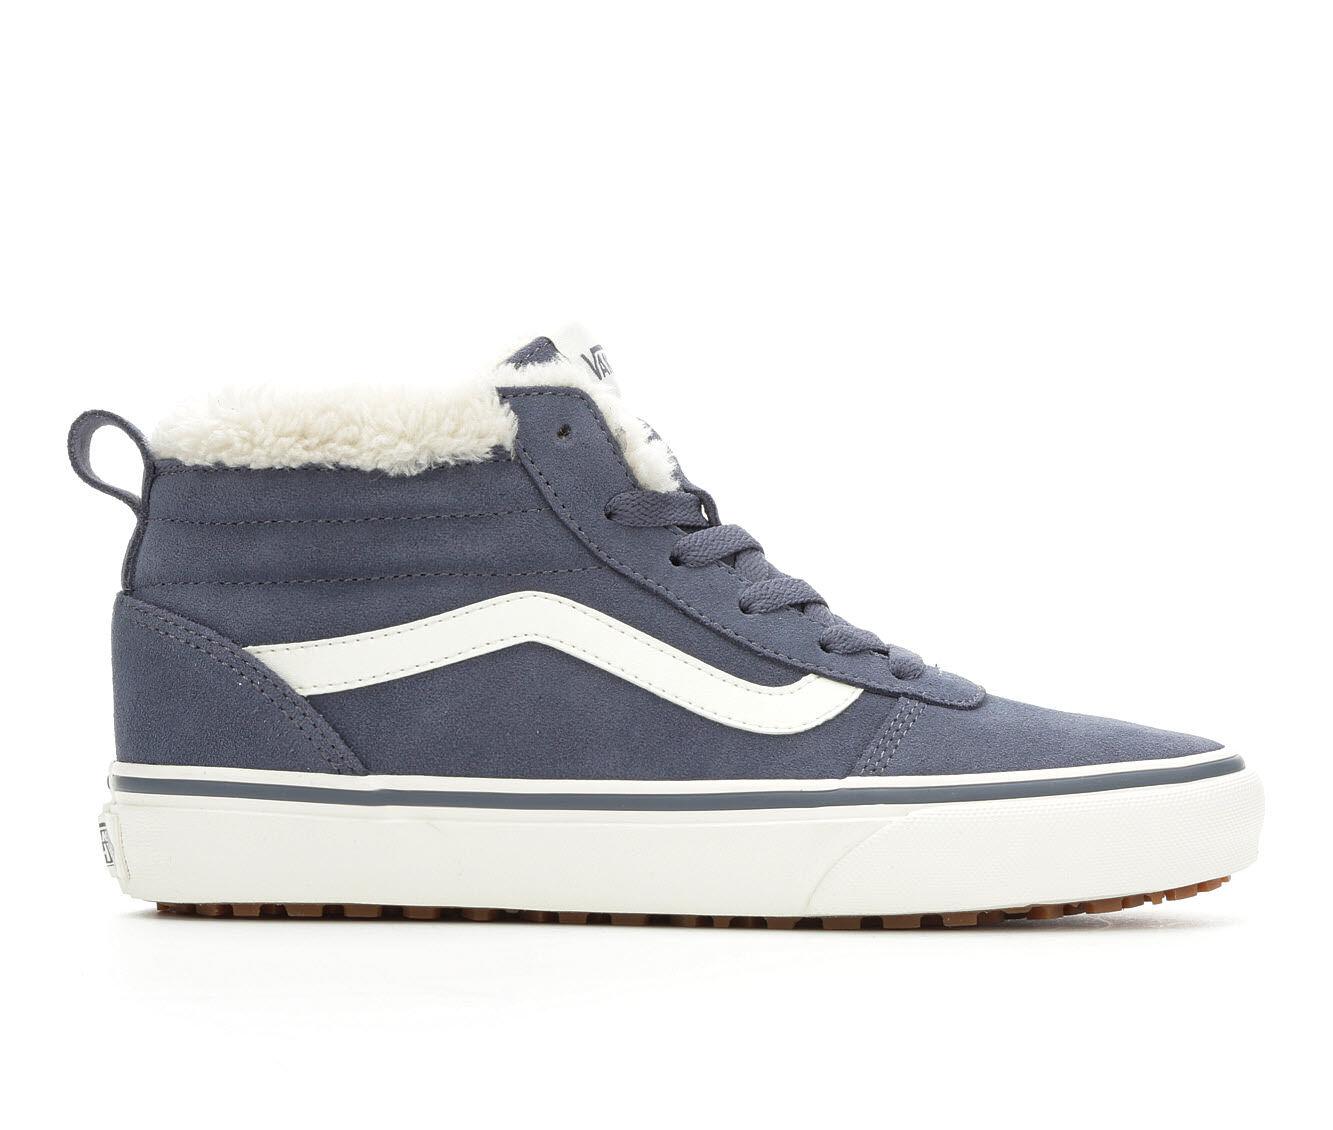 Women's Vans Ward Hi MTE Skate Shoes Grisialle/White